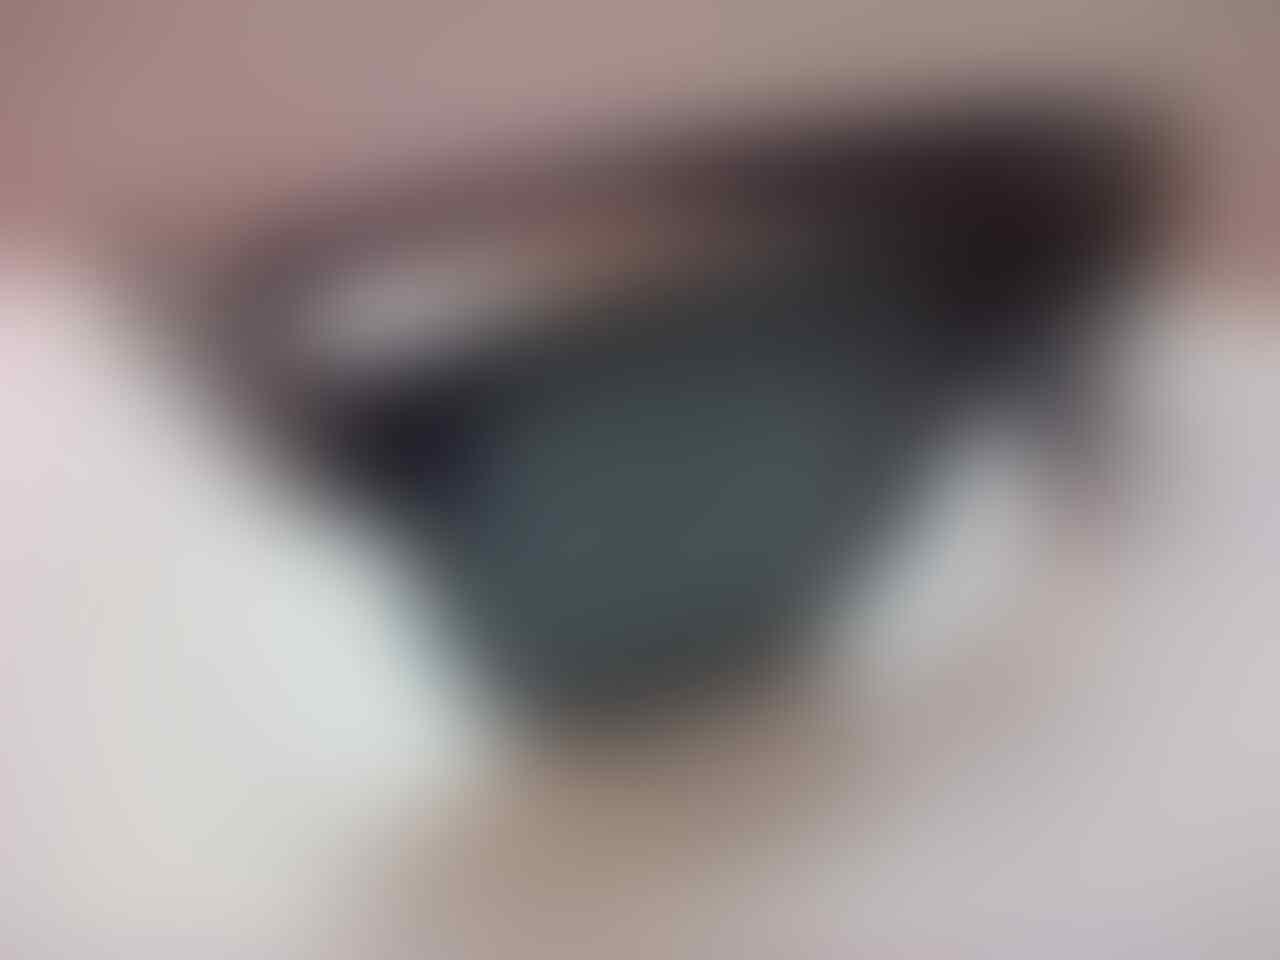 Fashion Kacamata Rayban Moscot Spy Kenblock Dll | Mirip Aslinya 99%